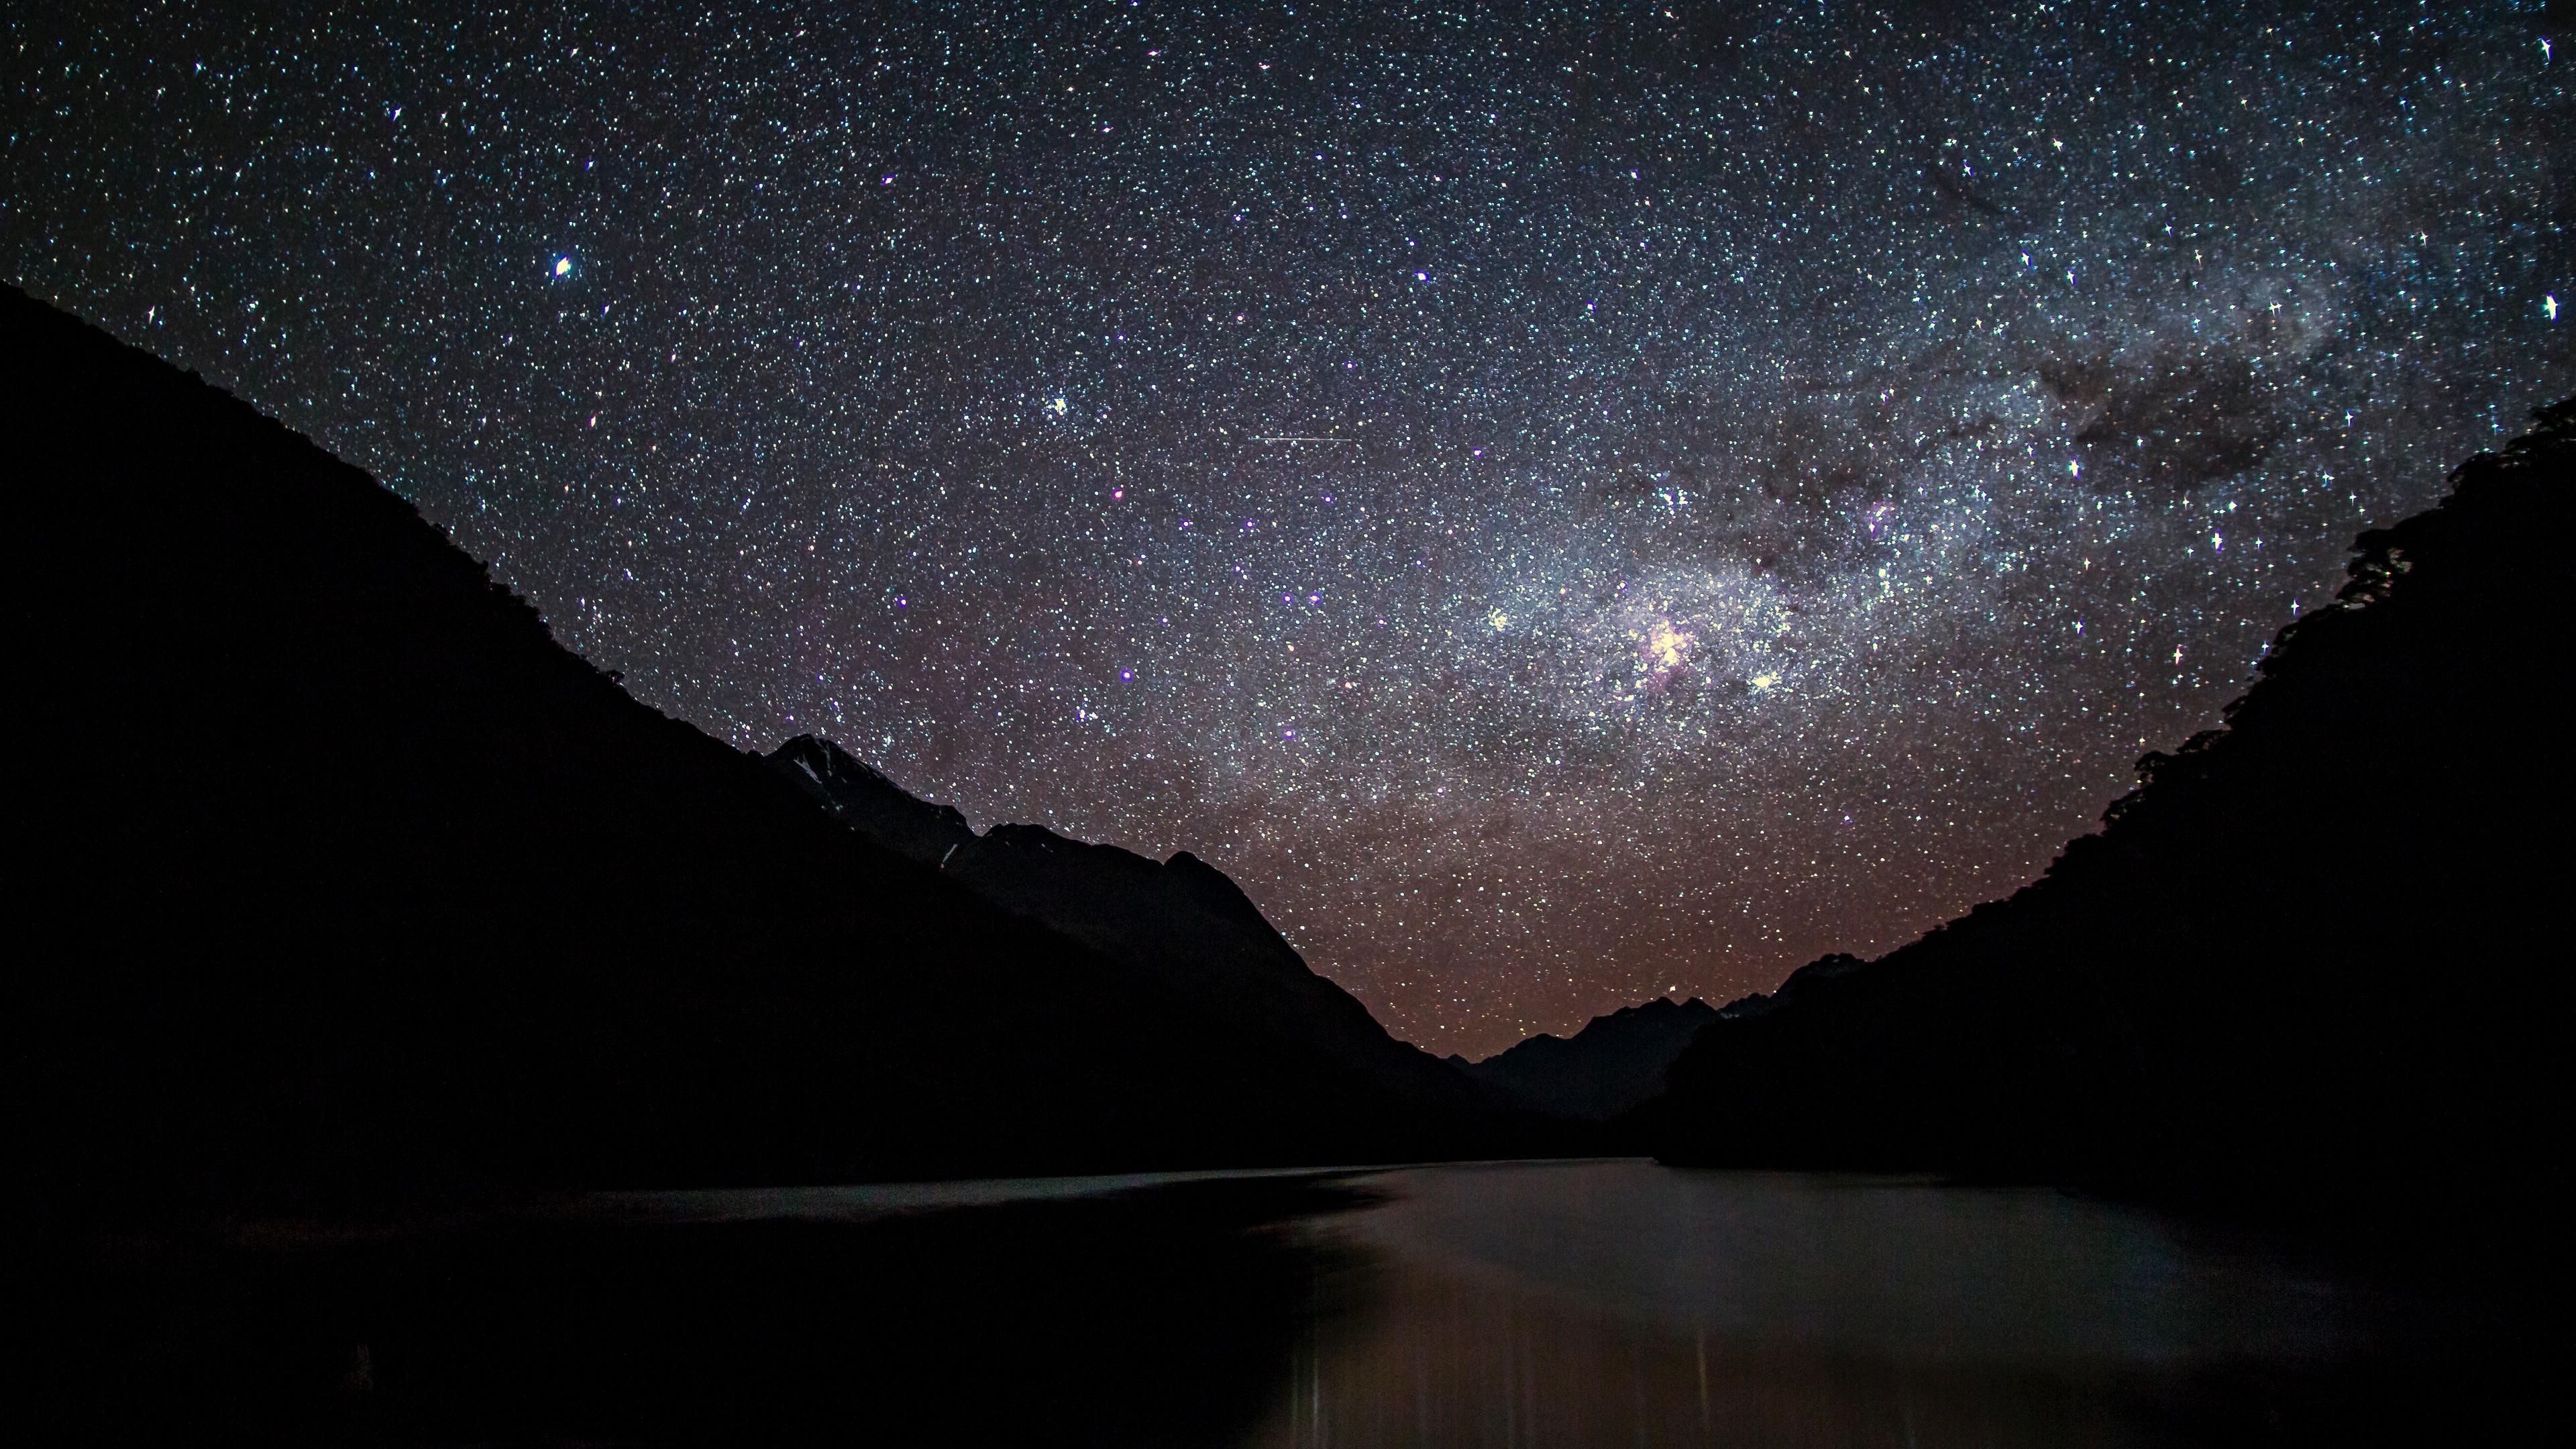 starry sky night mountains 4k 1536013926 - starry sky, night, mountains 4k - starry sky, Night, Mountains